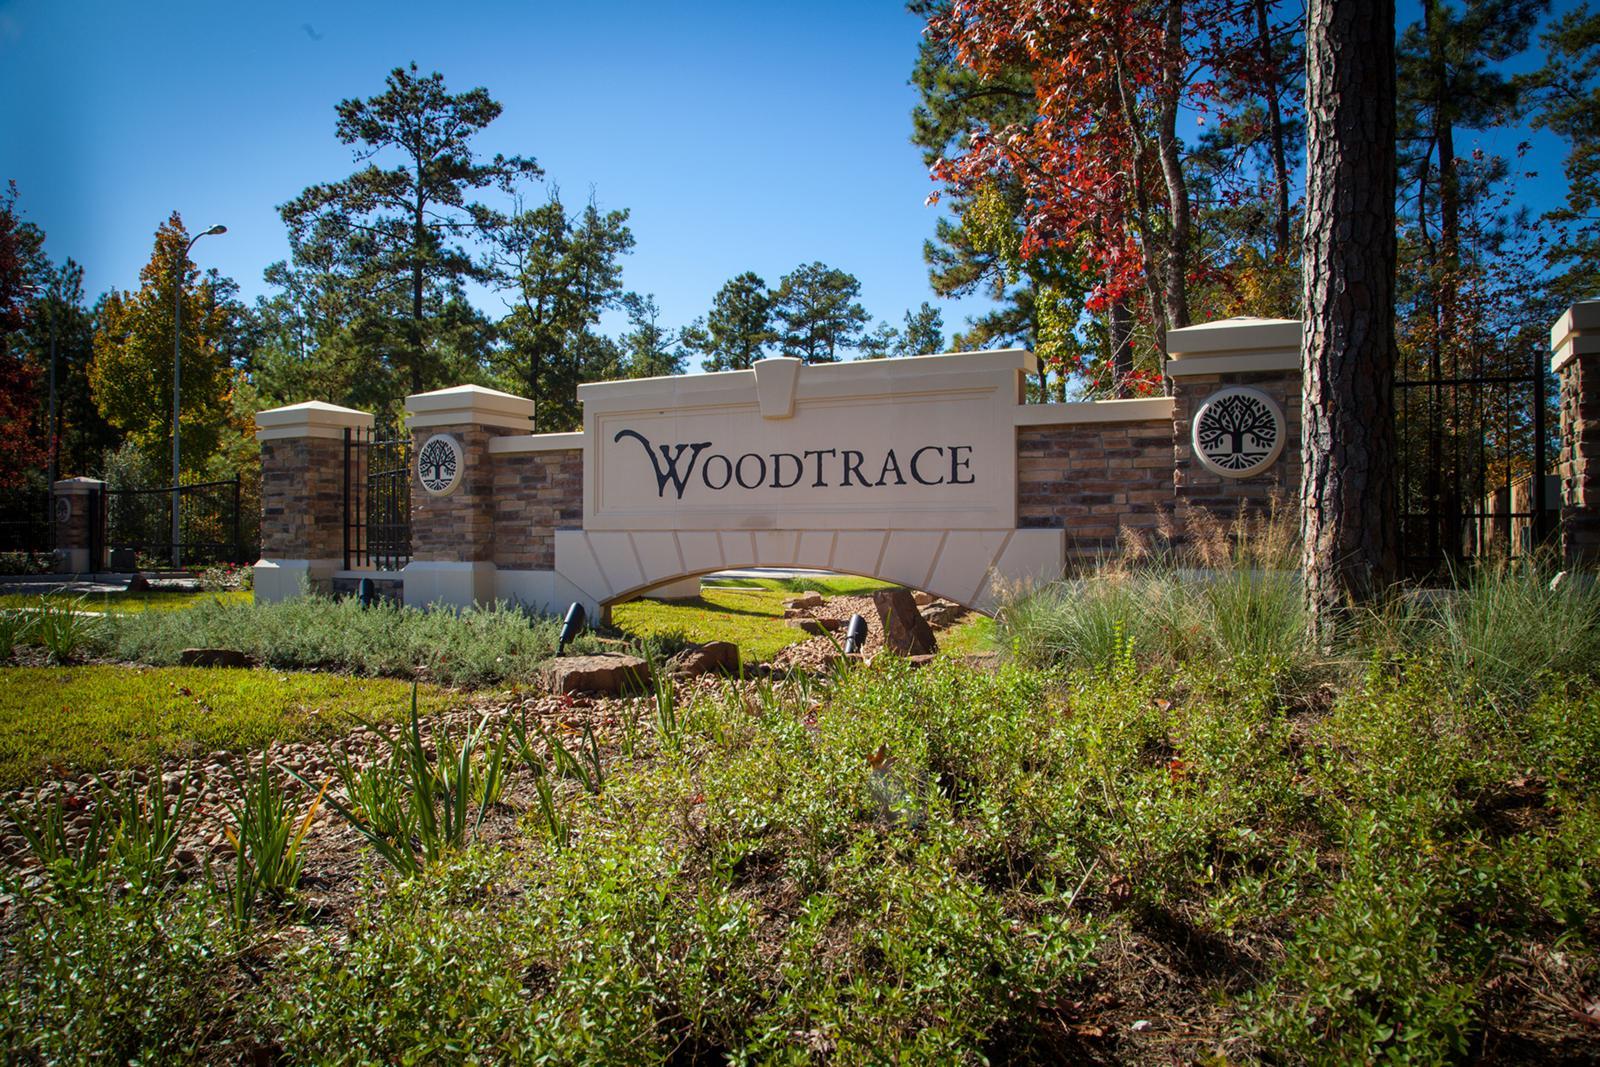 Woodtrace-Magnolia